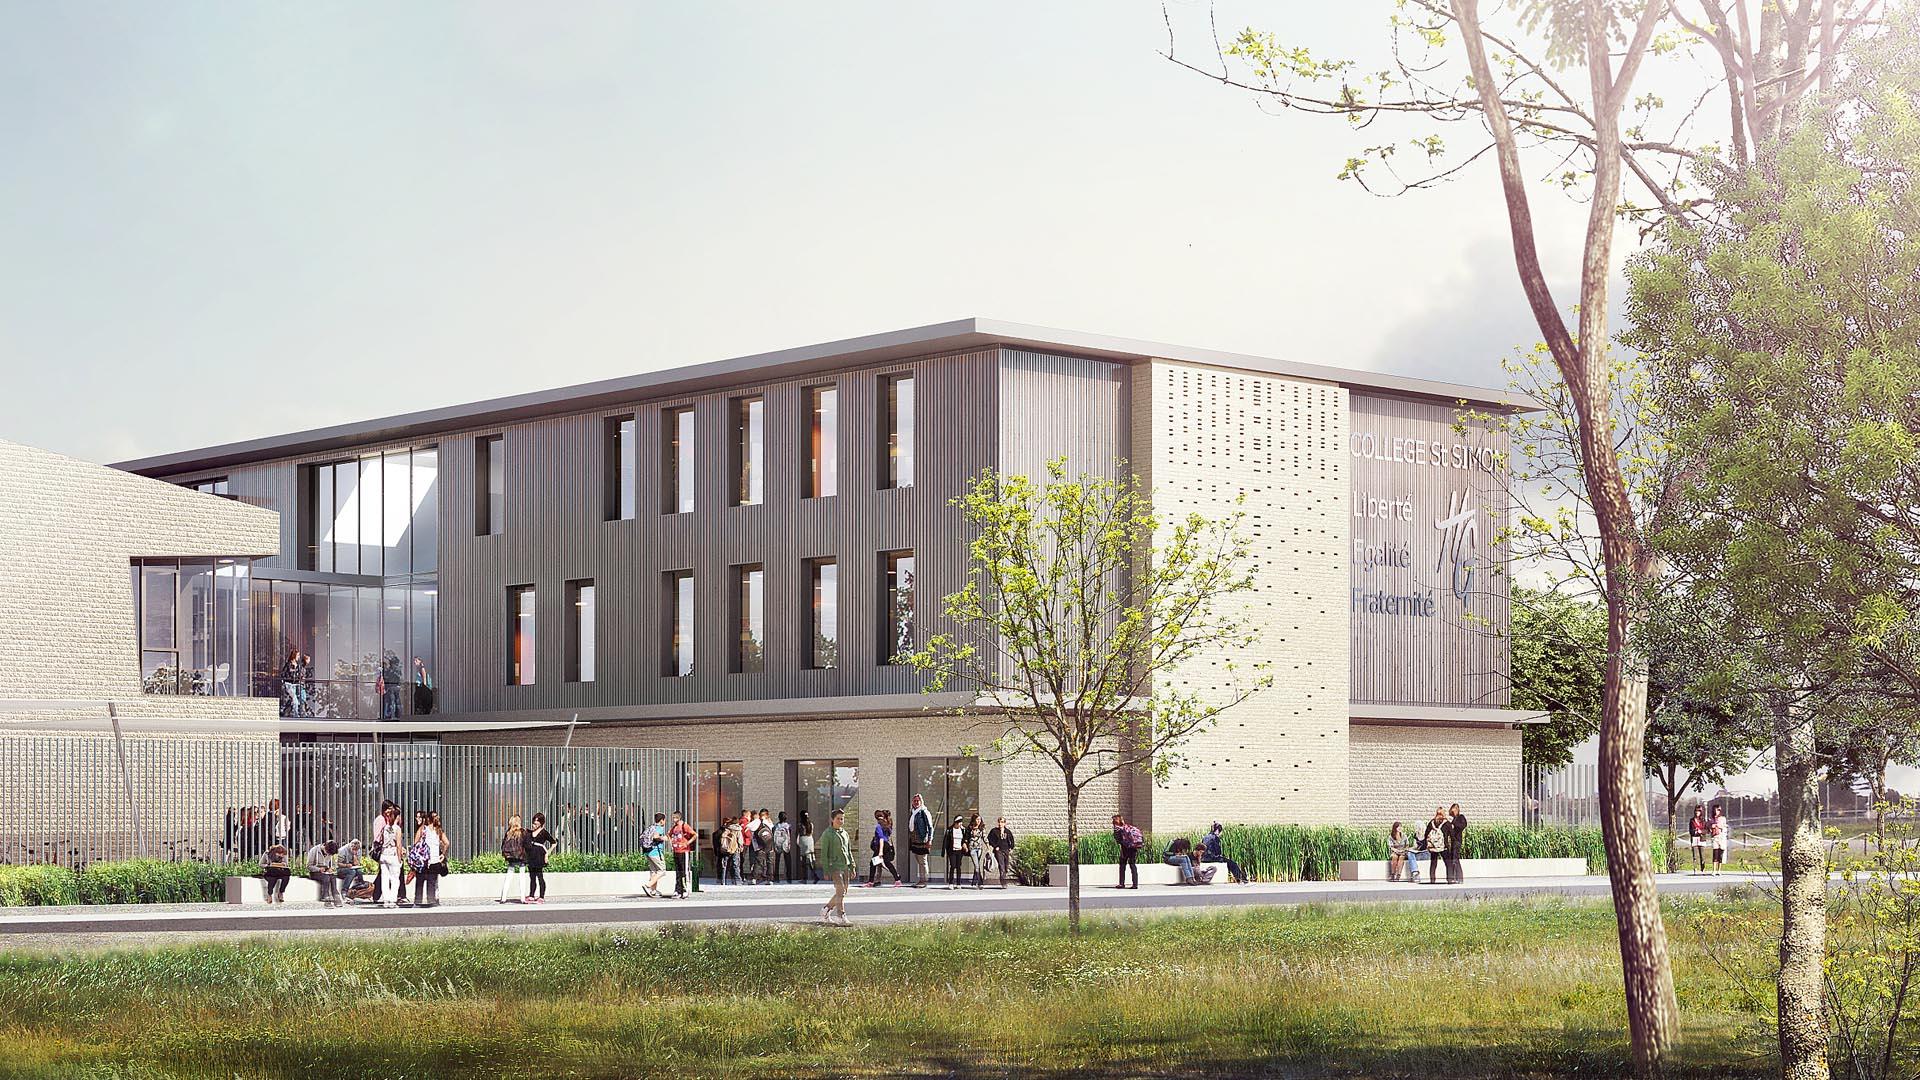 Seuil-architecture-Construction-College-St-Simon-06